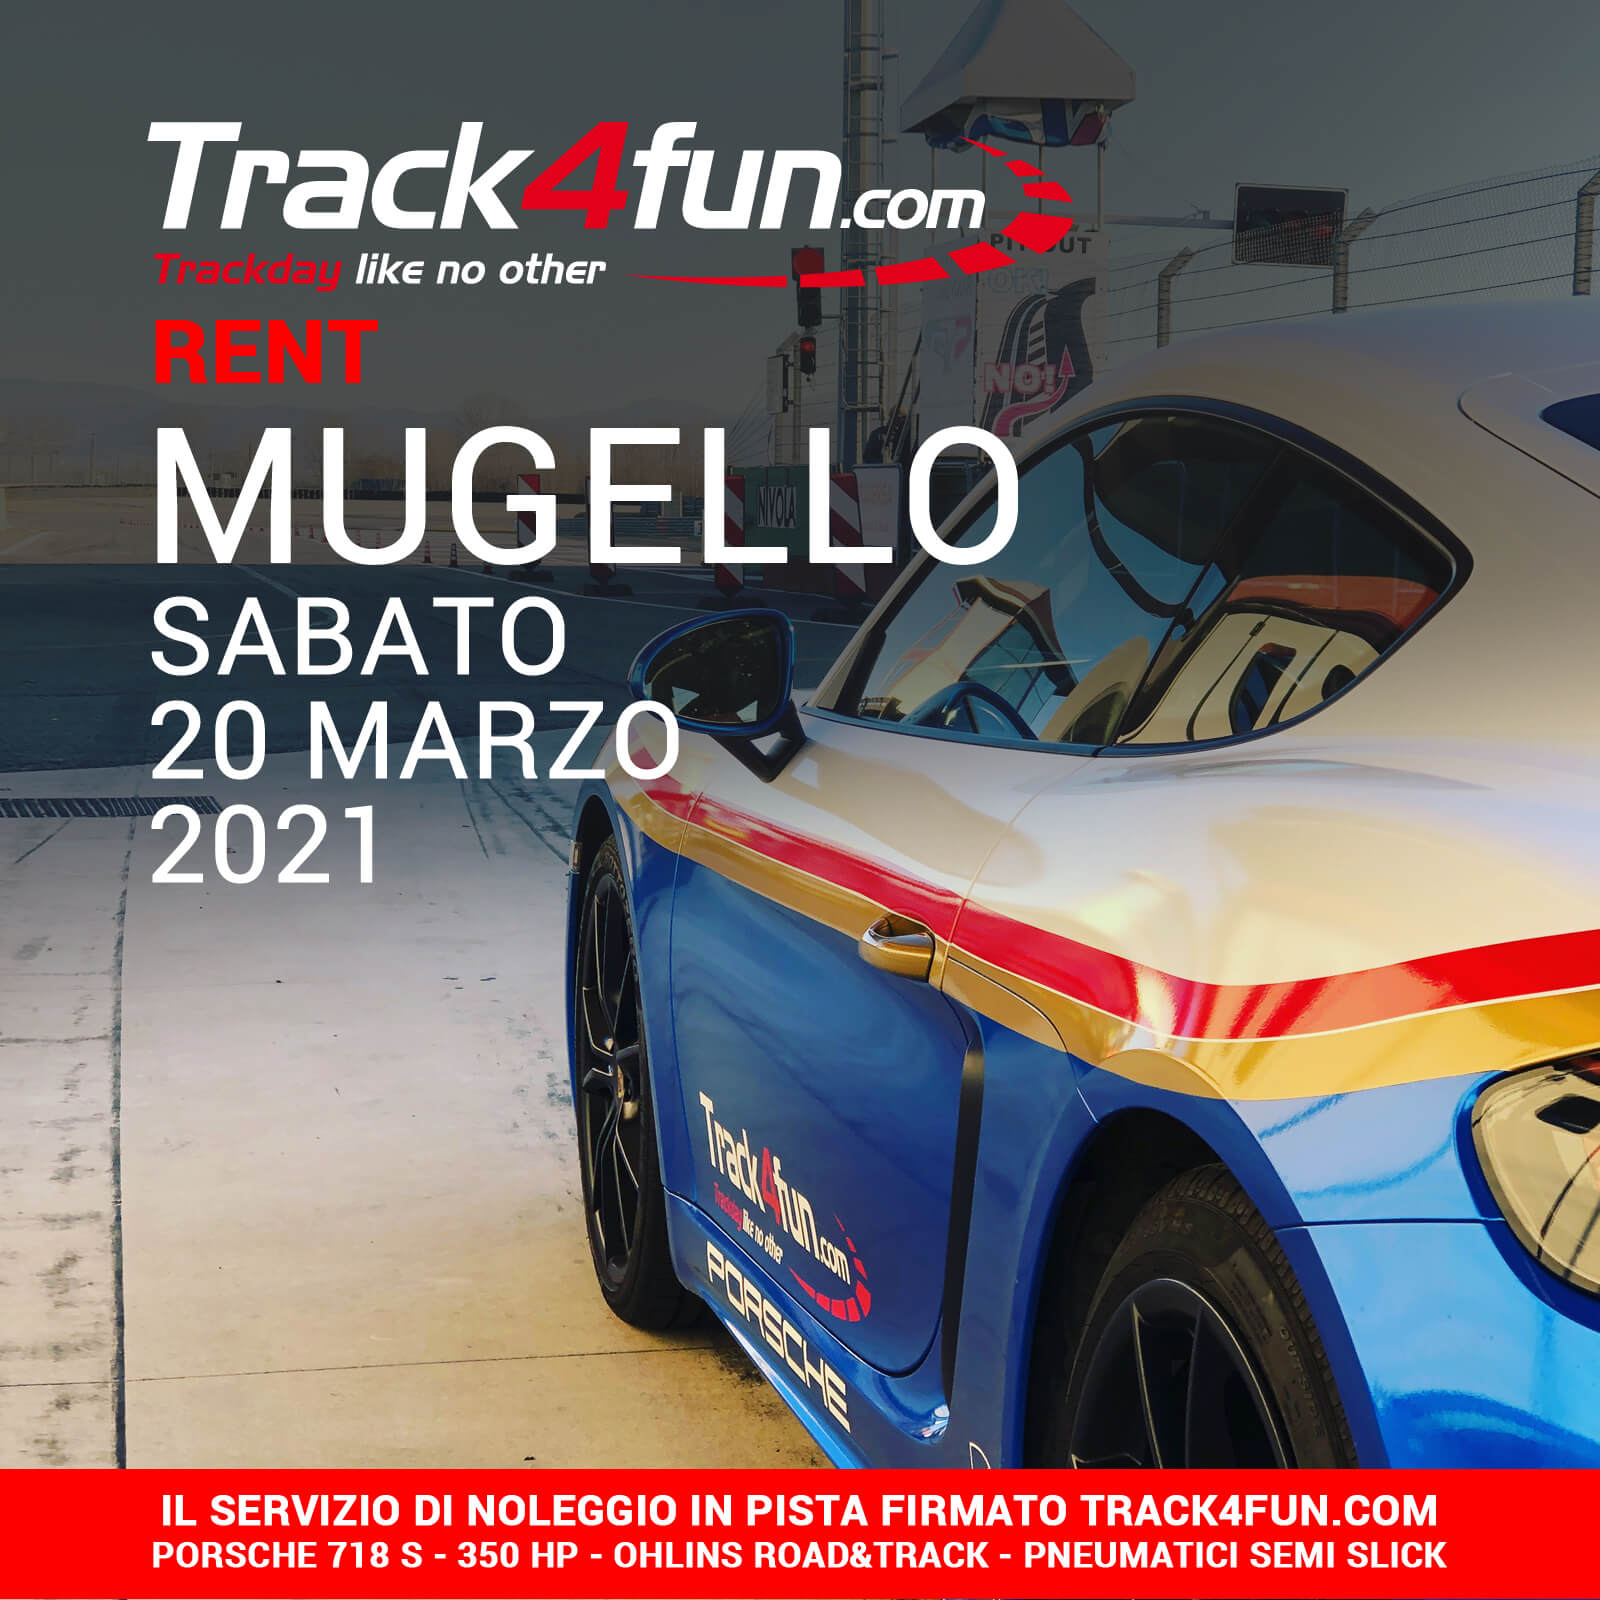 Track4fun Rent Mugello 20-03-2021